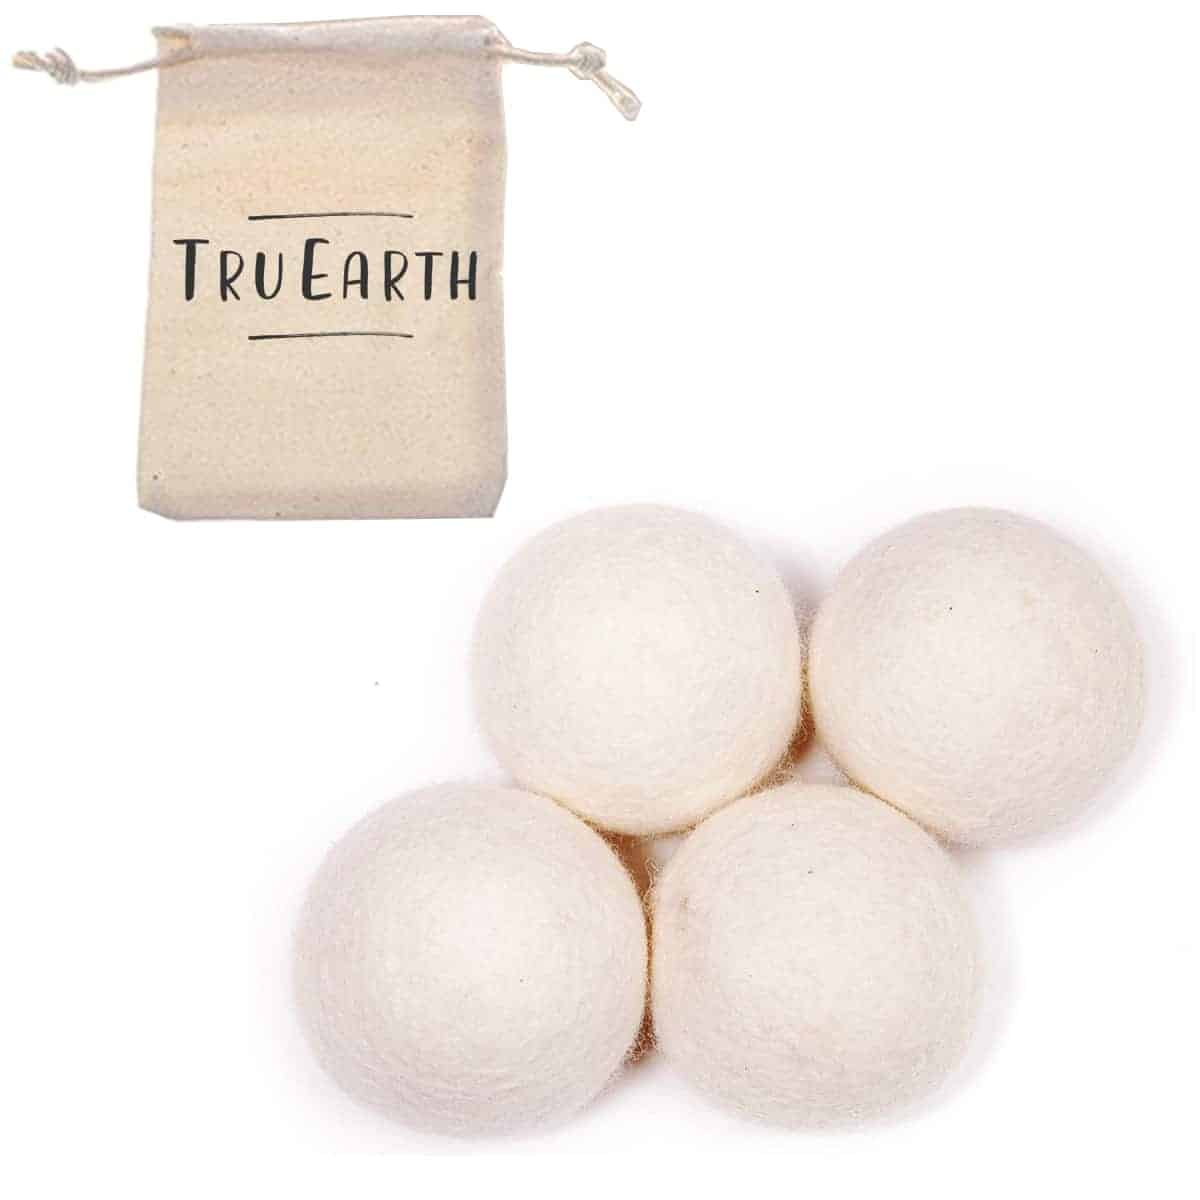 Tru Earth - Wool Dryer Balls by Tru Earth – Reusable Fabric Softener | NOW: $22.95